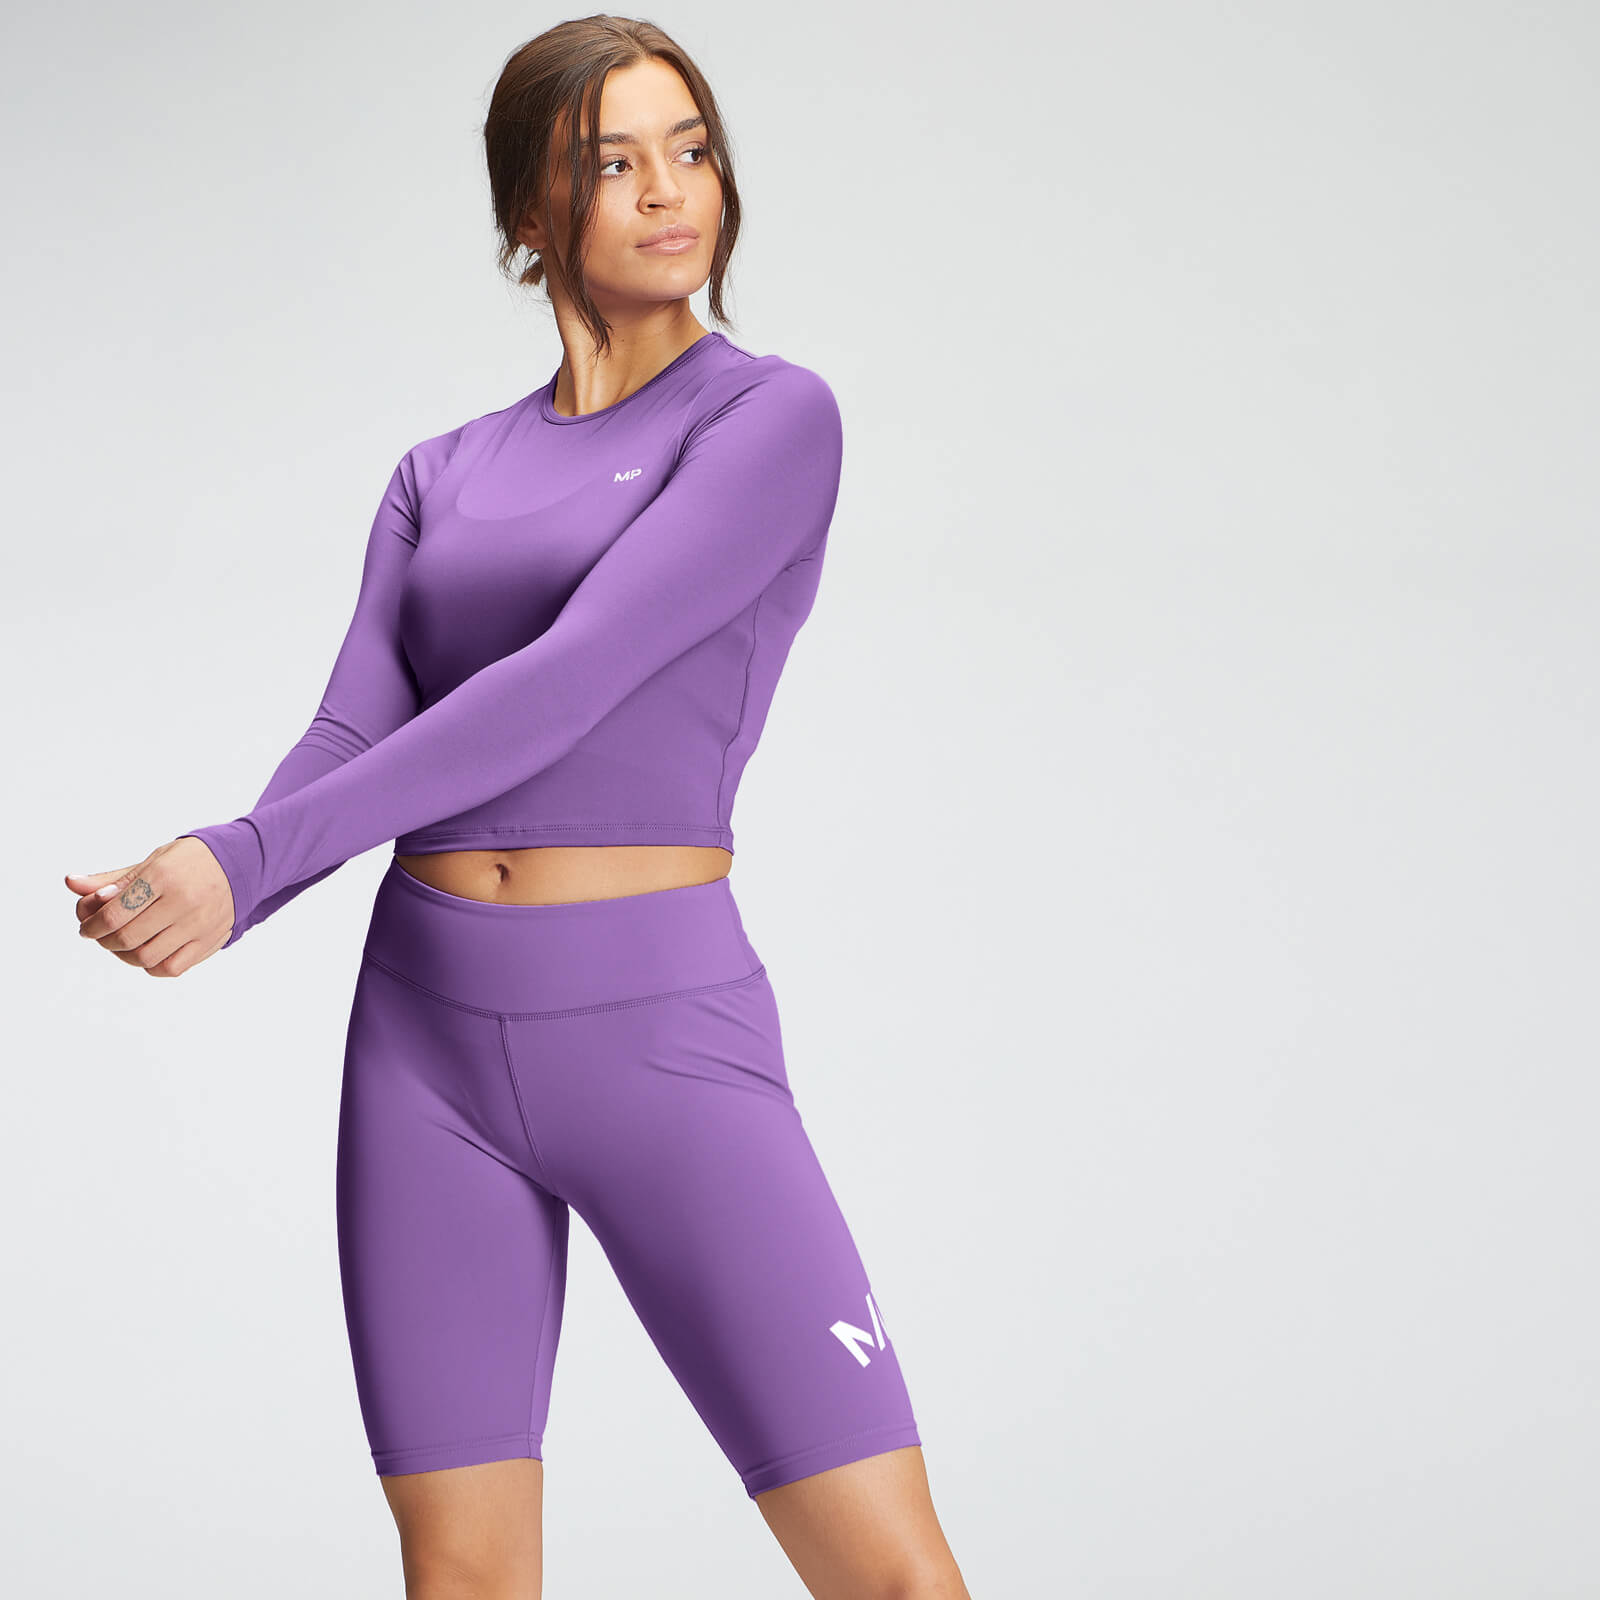 Купить MP Women's Essentials Training Dry Tech Long Sleeve Crop Top - Deep Lilac - XL, Myprotein International